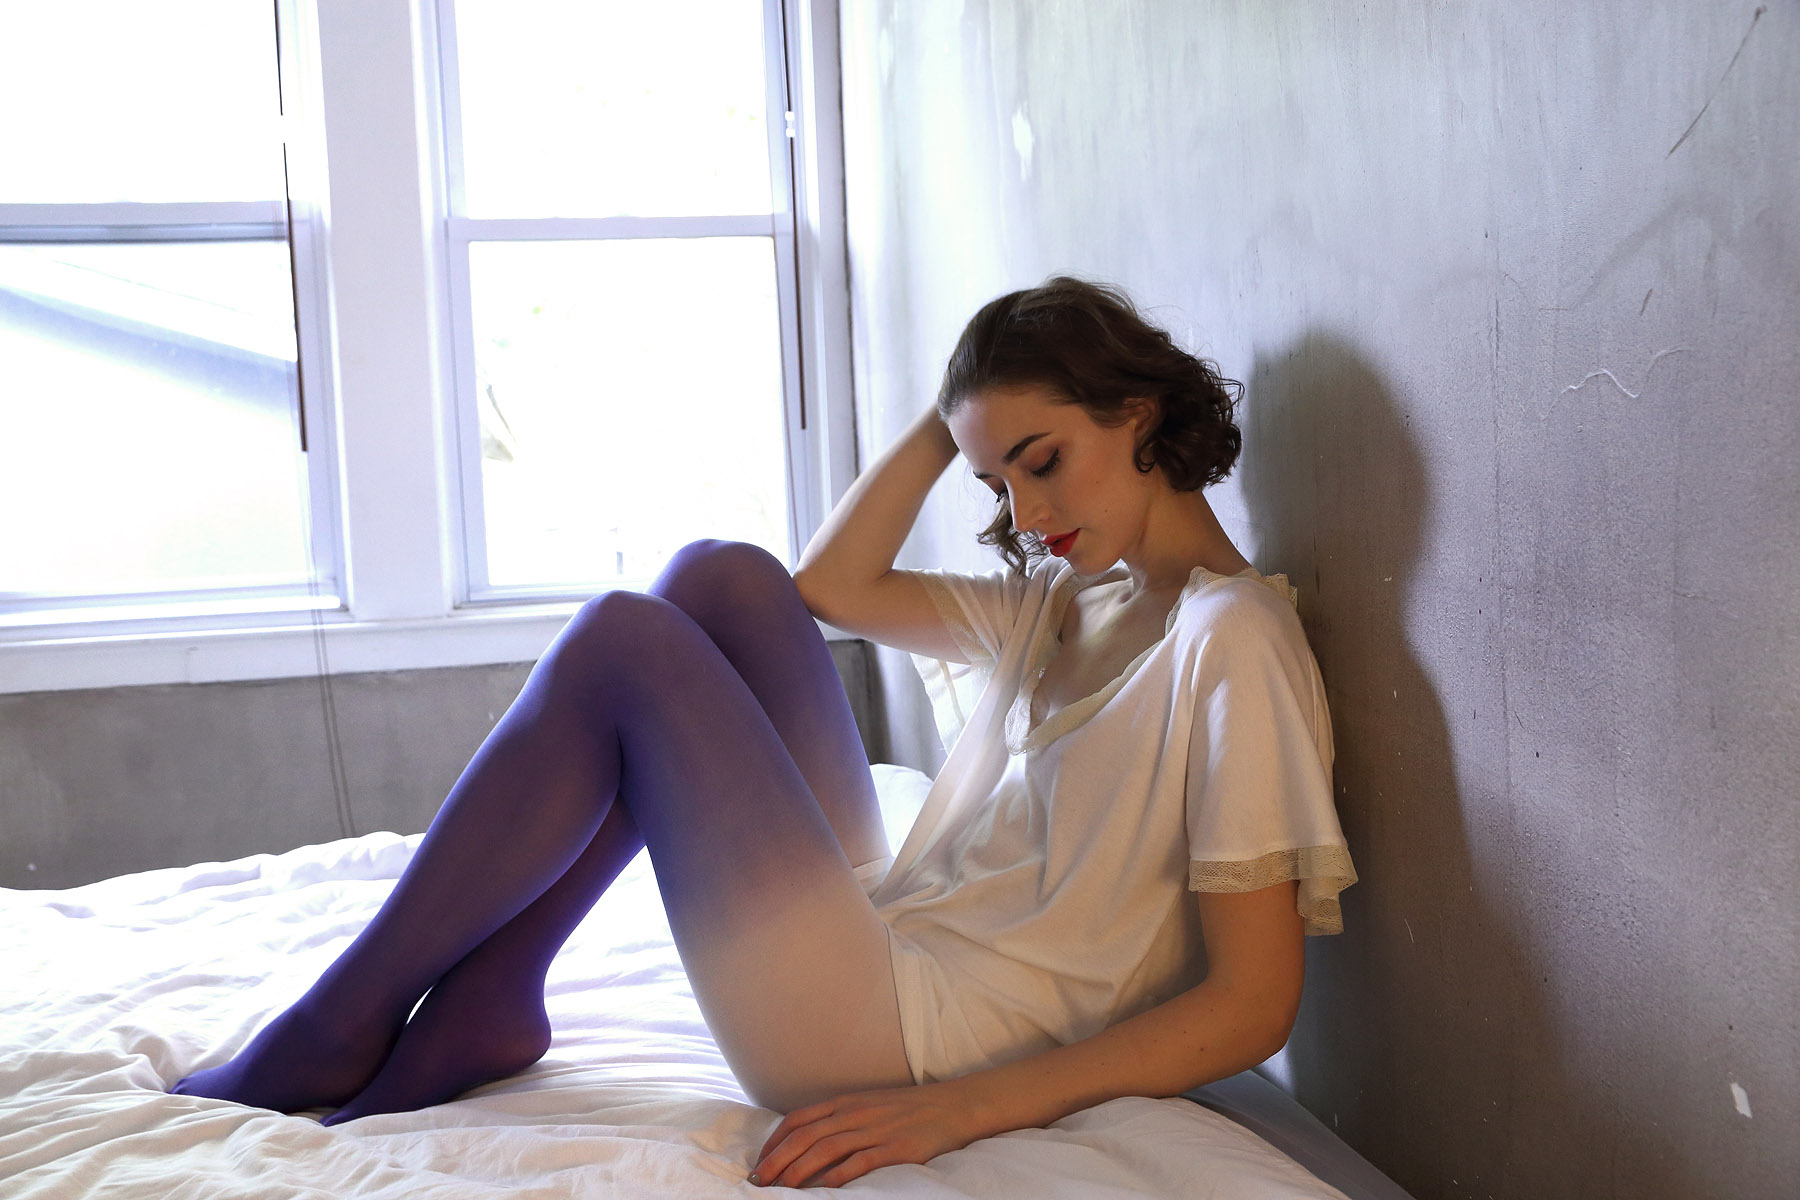 holiday-14-bts-lingerie-lookbook-ivory-tee-blue-white-dip-dye-tights-bed-2.jpg